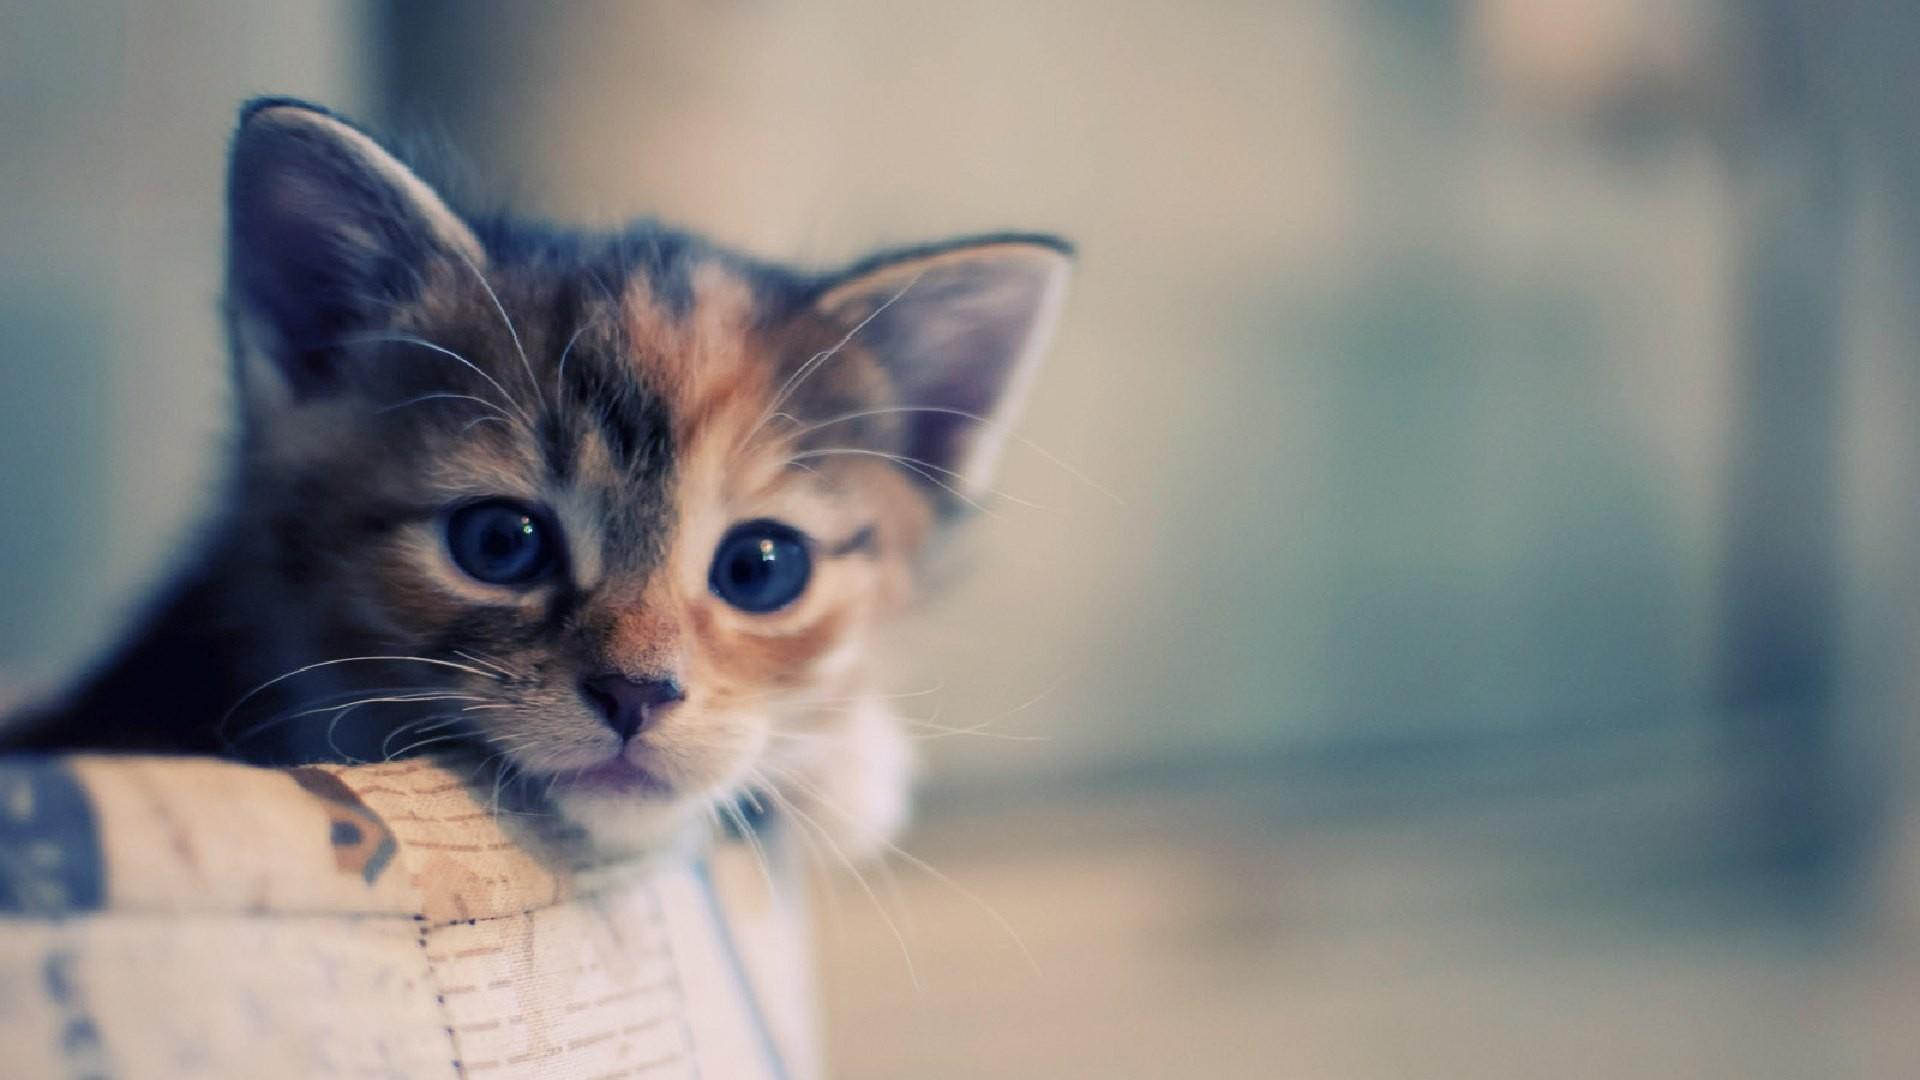 Cute Hello Kitty Face Wallpaper Cat Backgrounds Desktop Pixelstalk Net